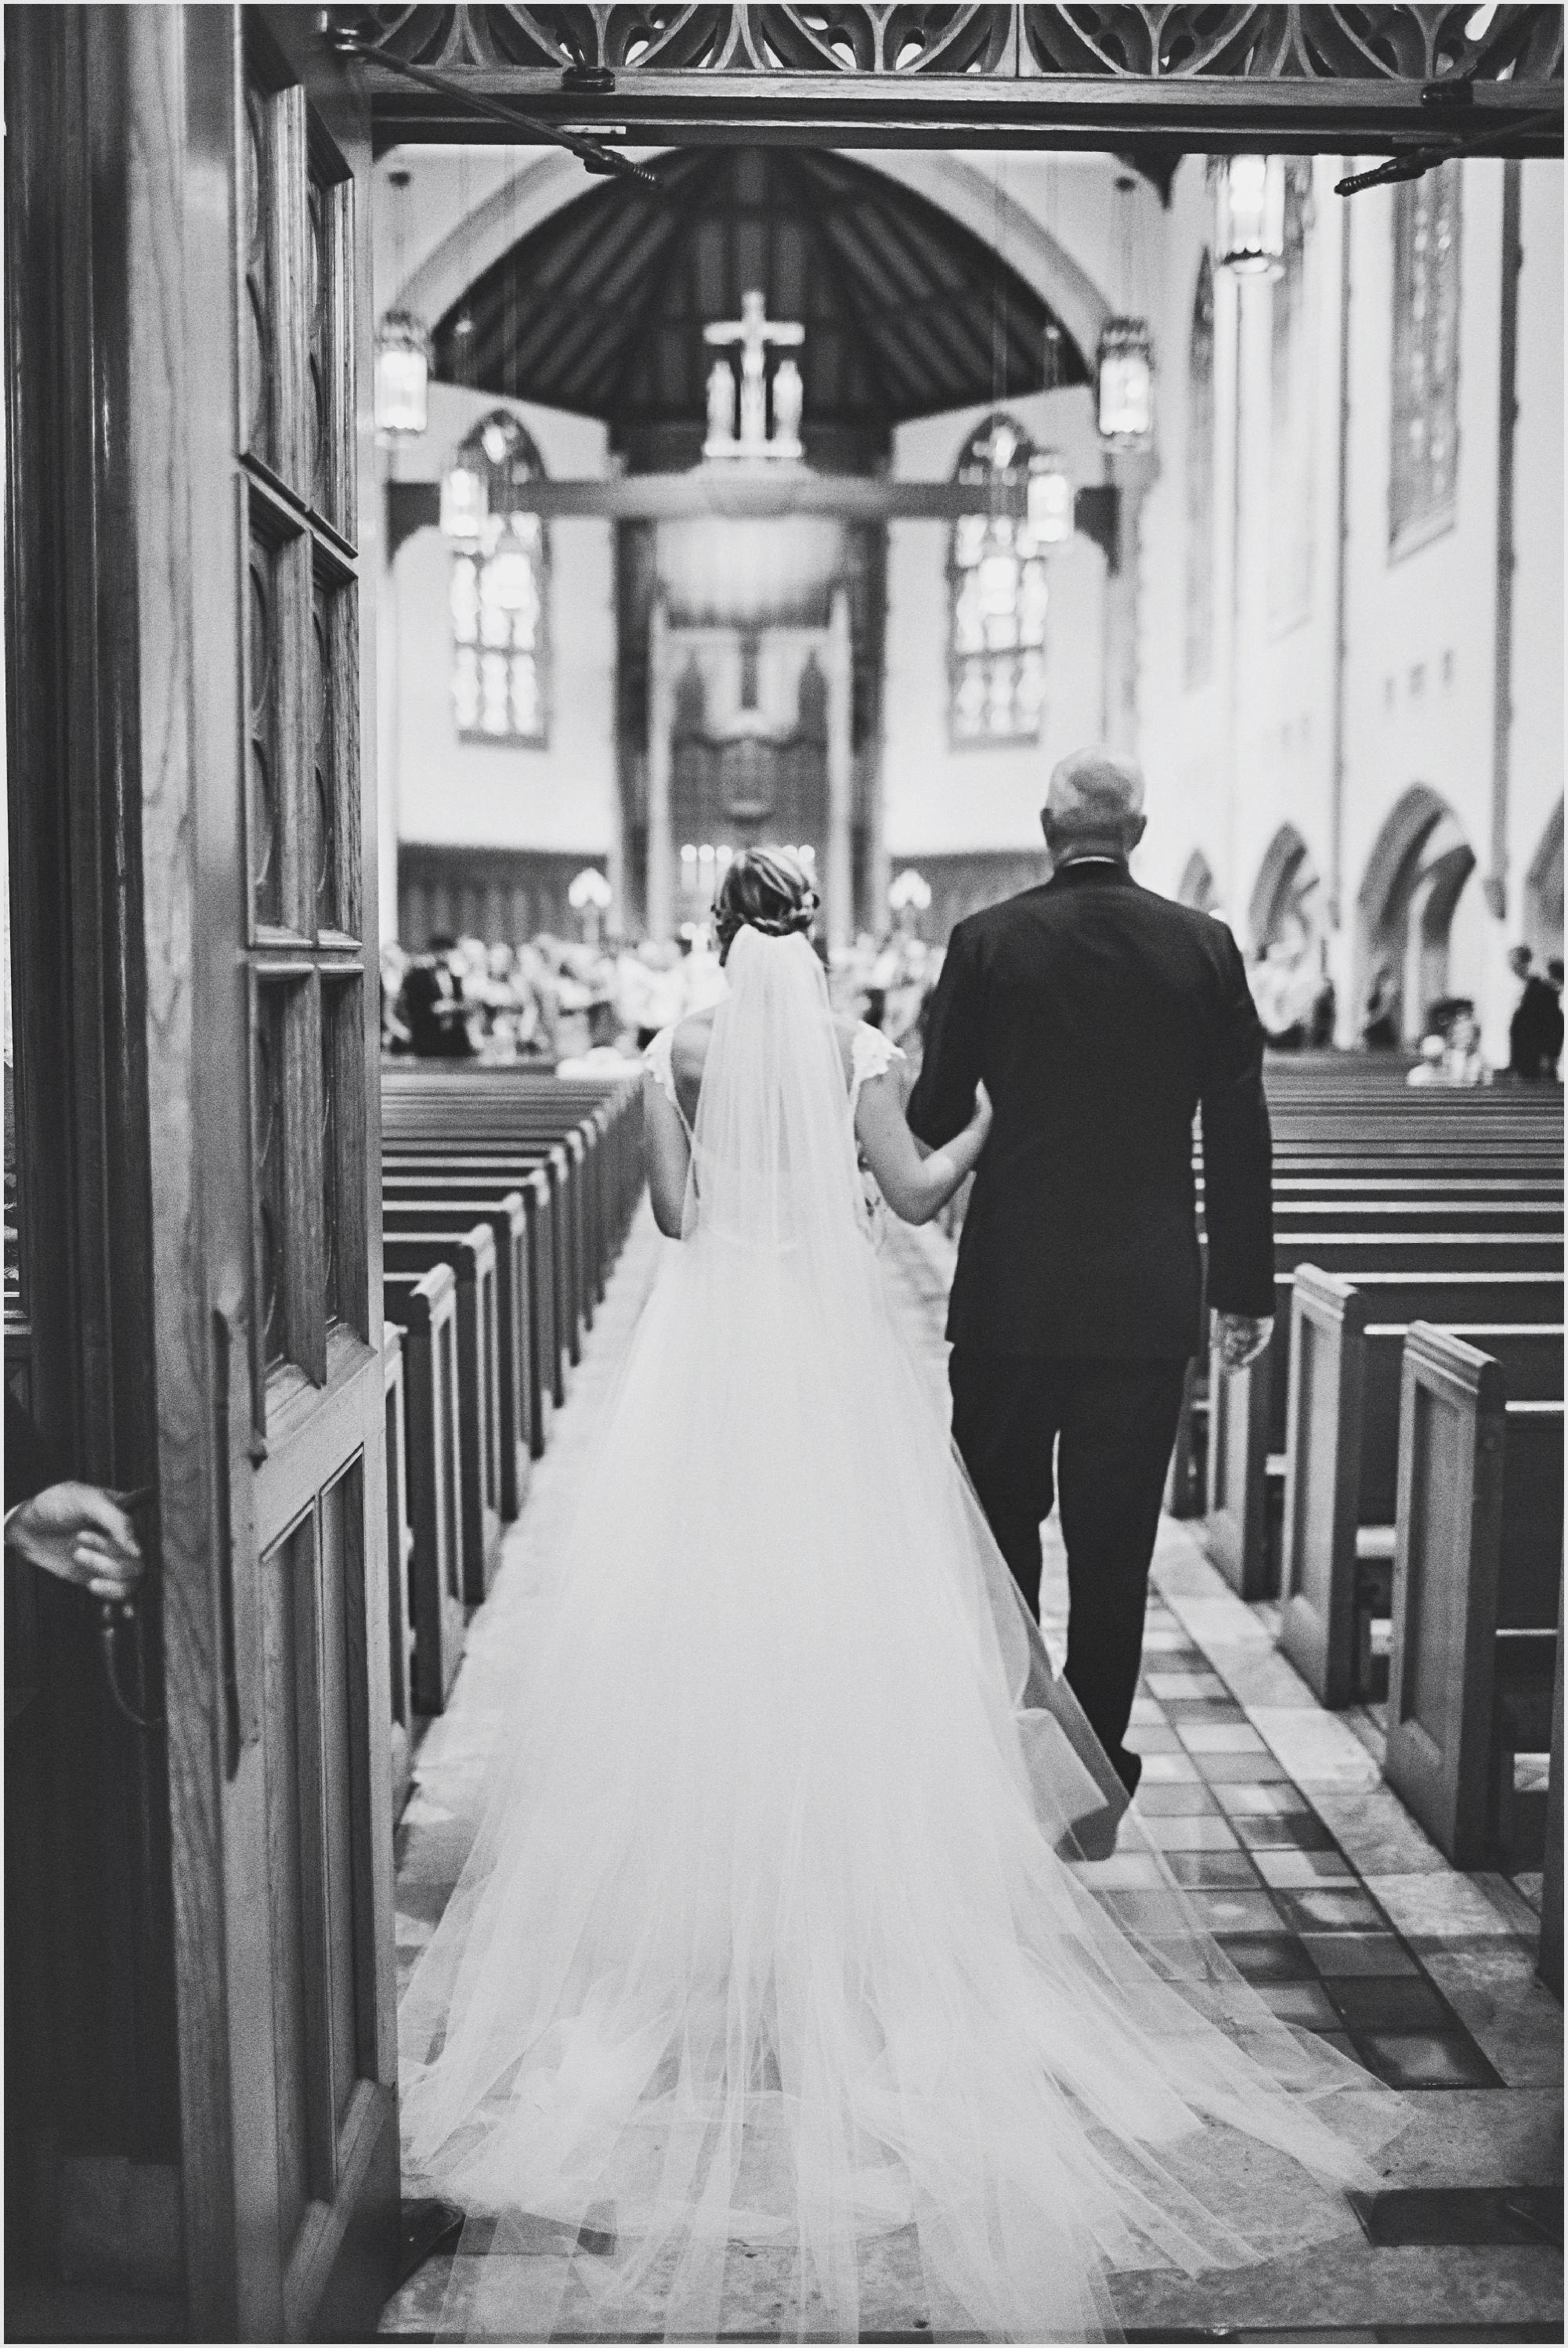 maura_david_james_j_hill_wedding_lucas_botz_photography_016.jpg